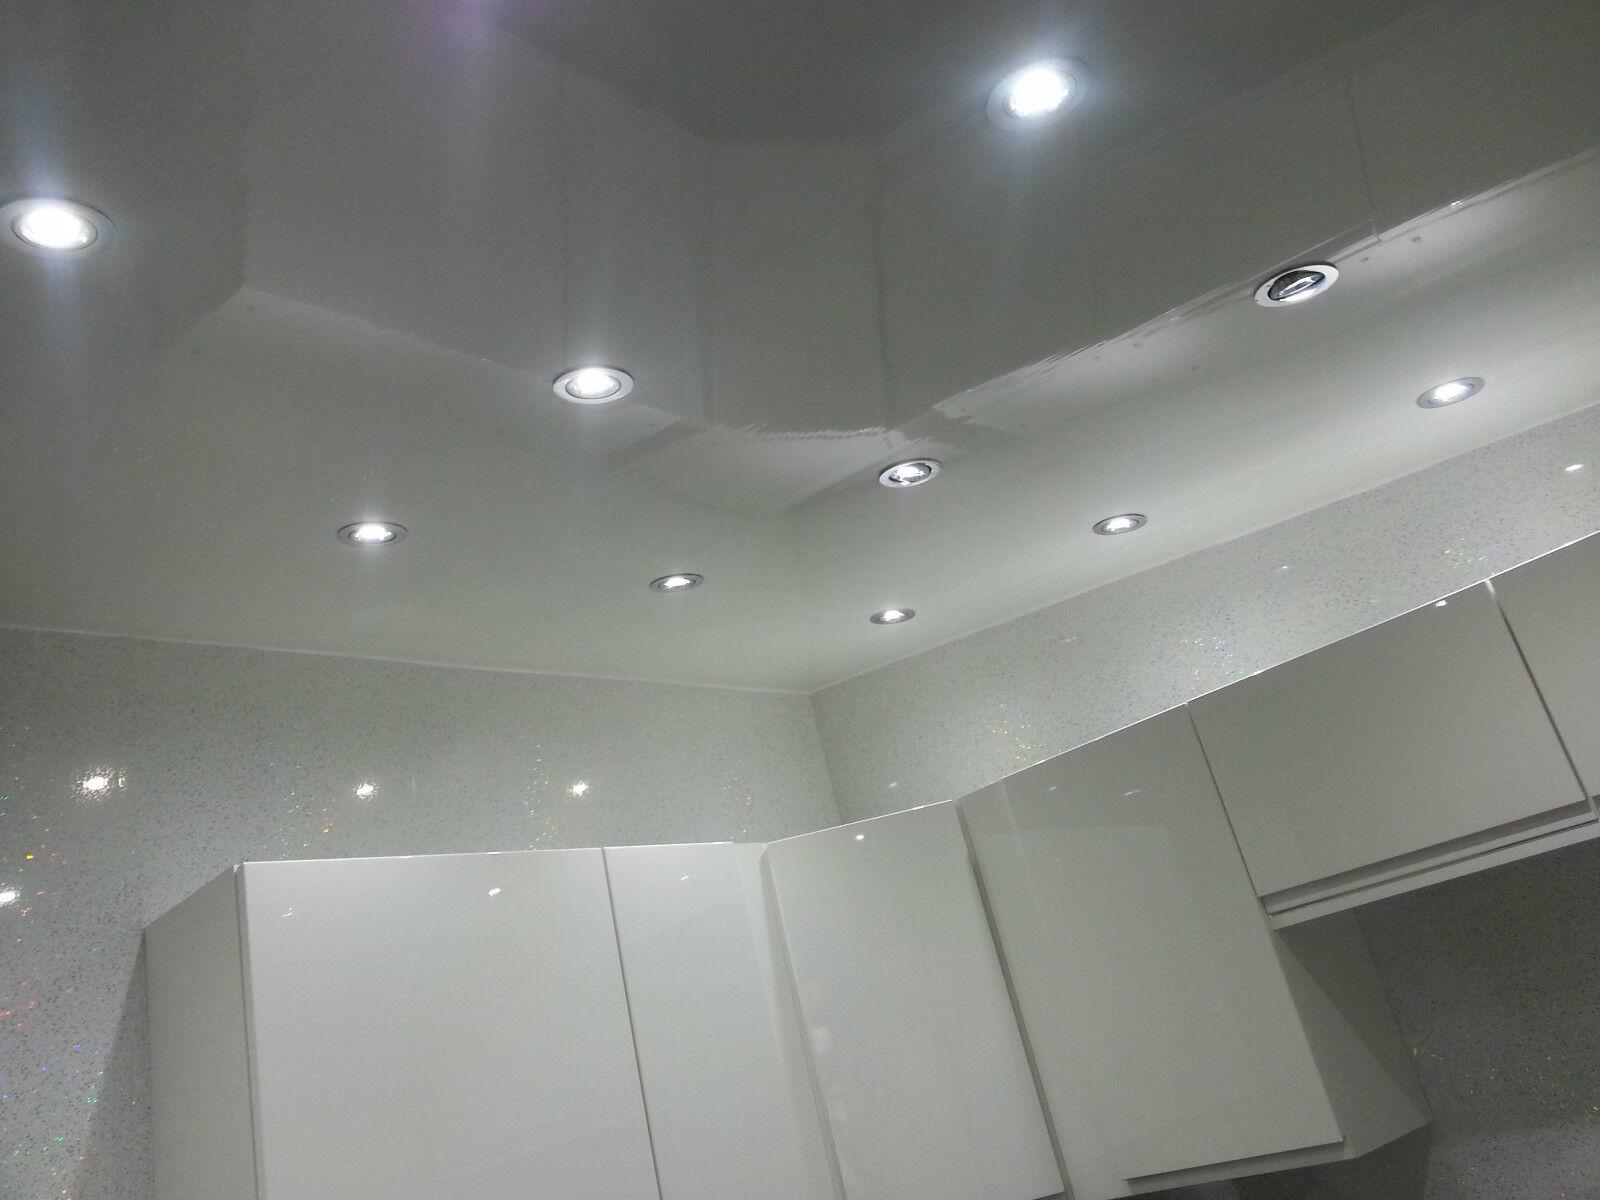 5 Plain White Decor Cladding Wall & Ceiling Panels PVC